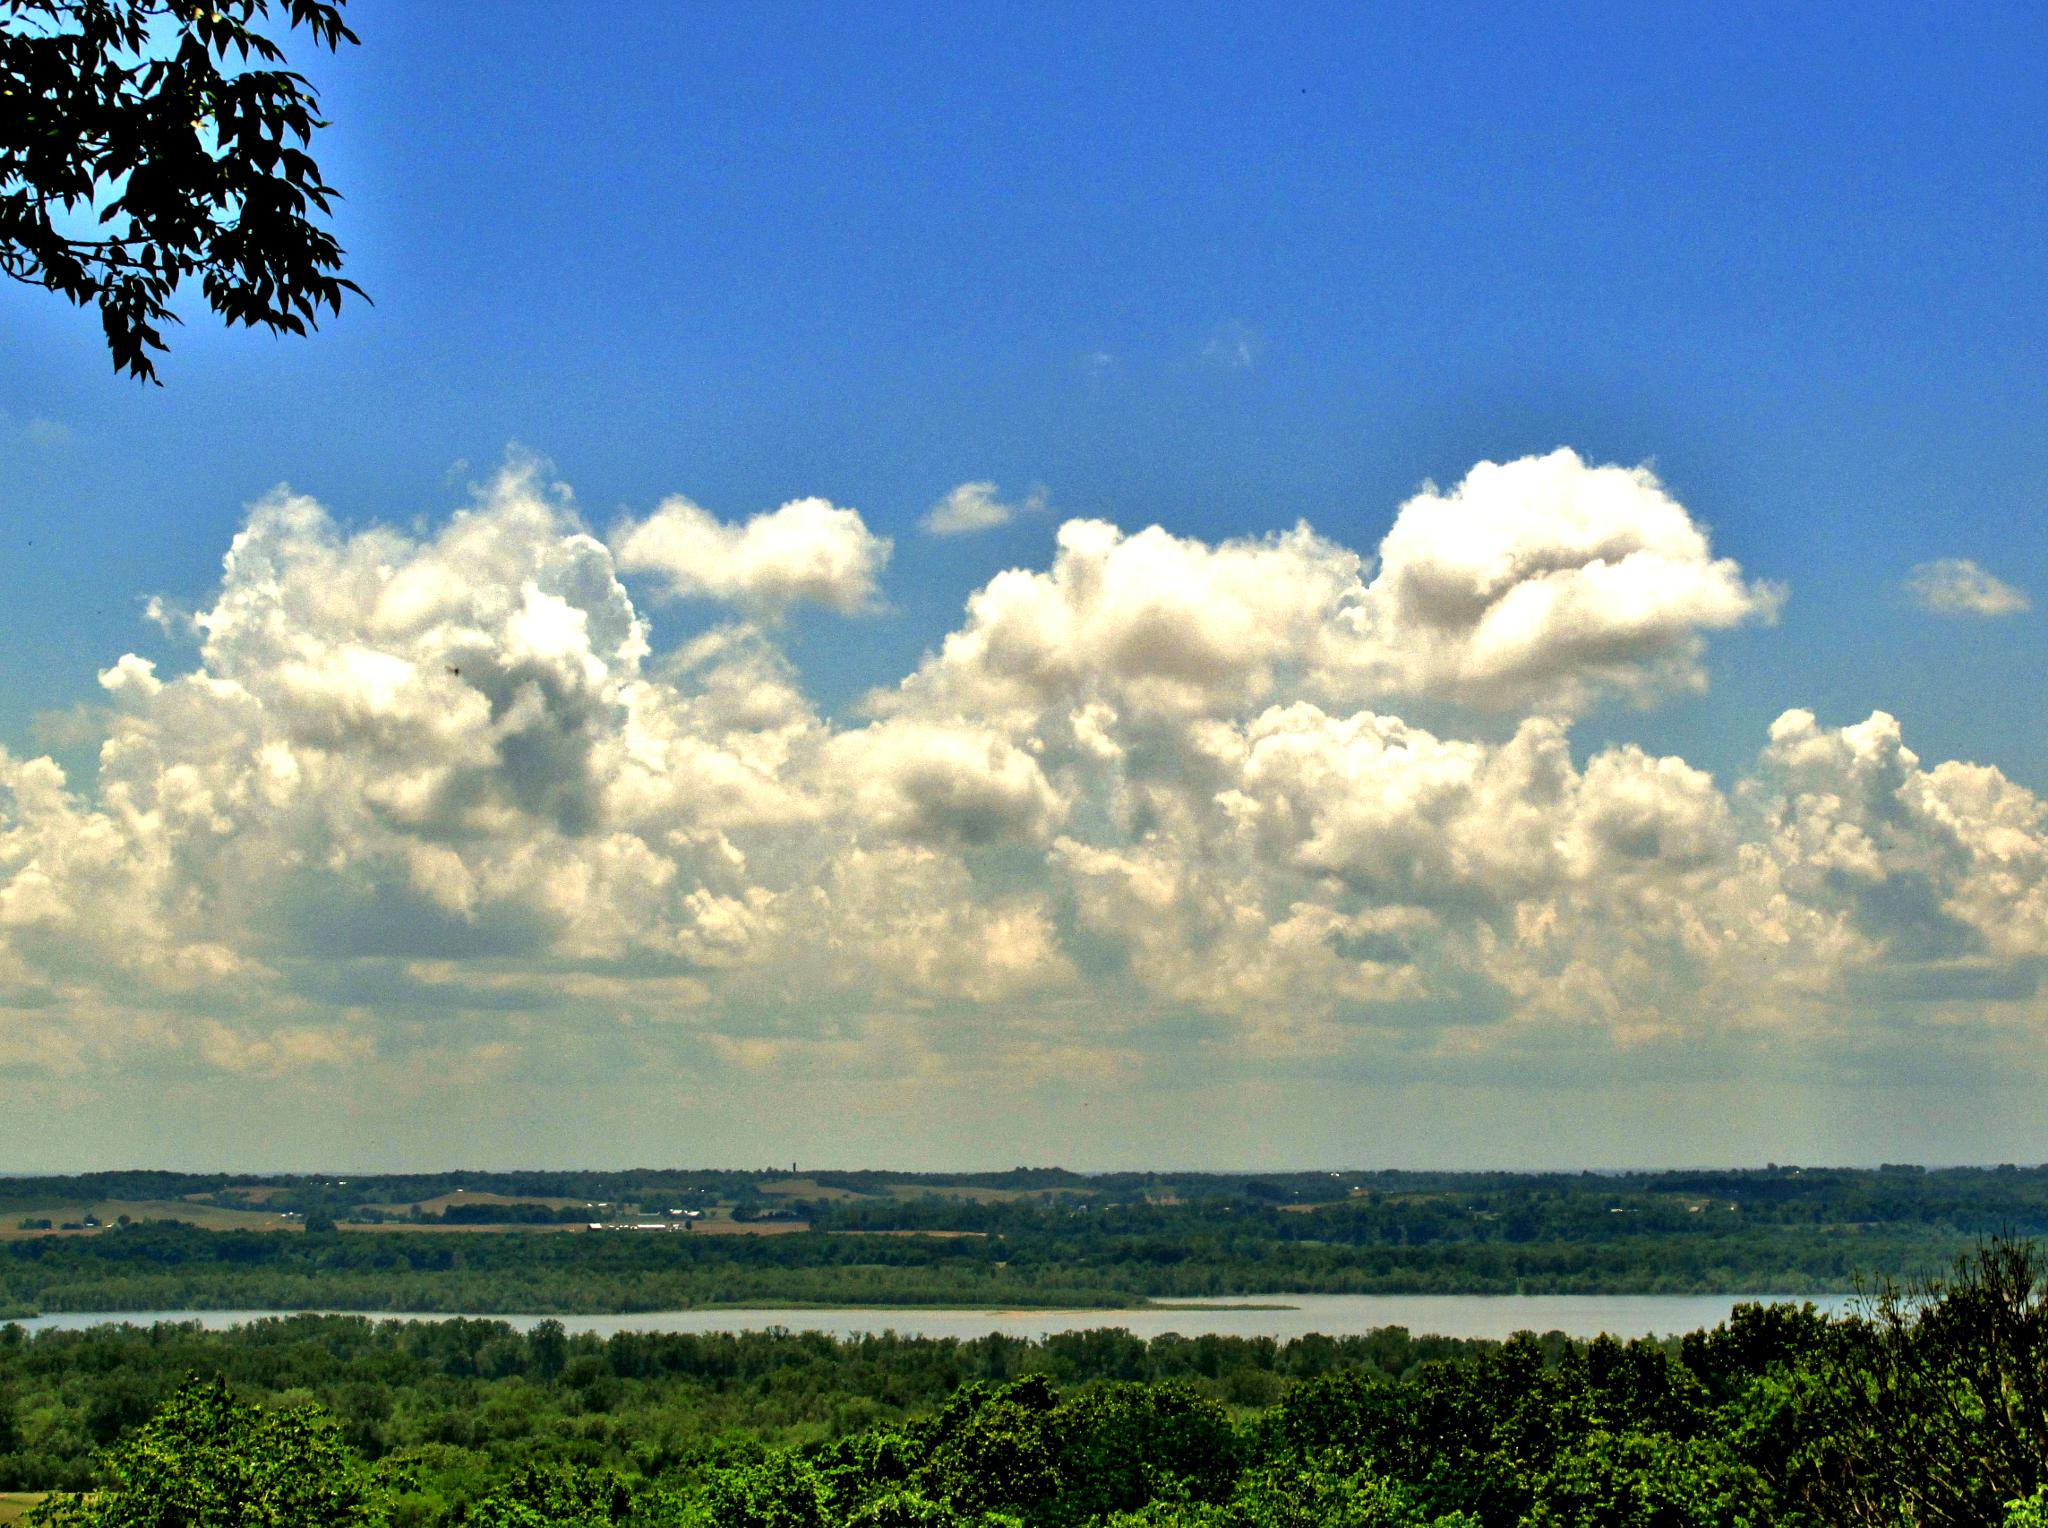 Illinois River by debbylesko